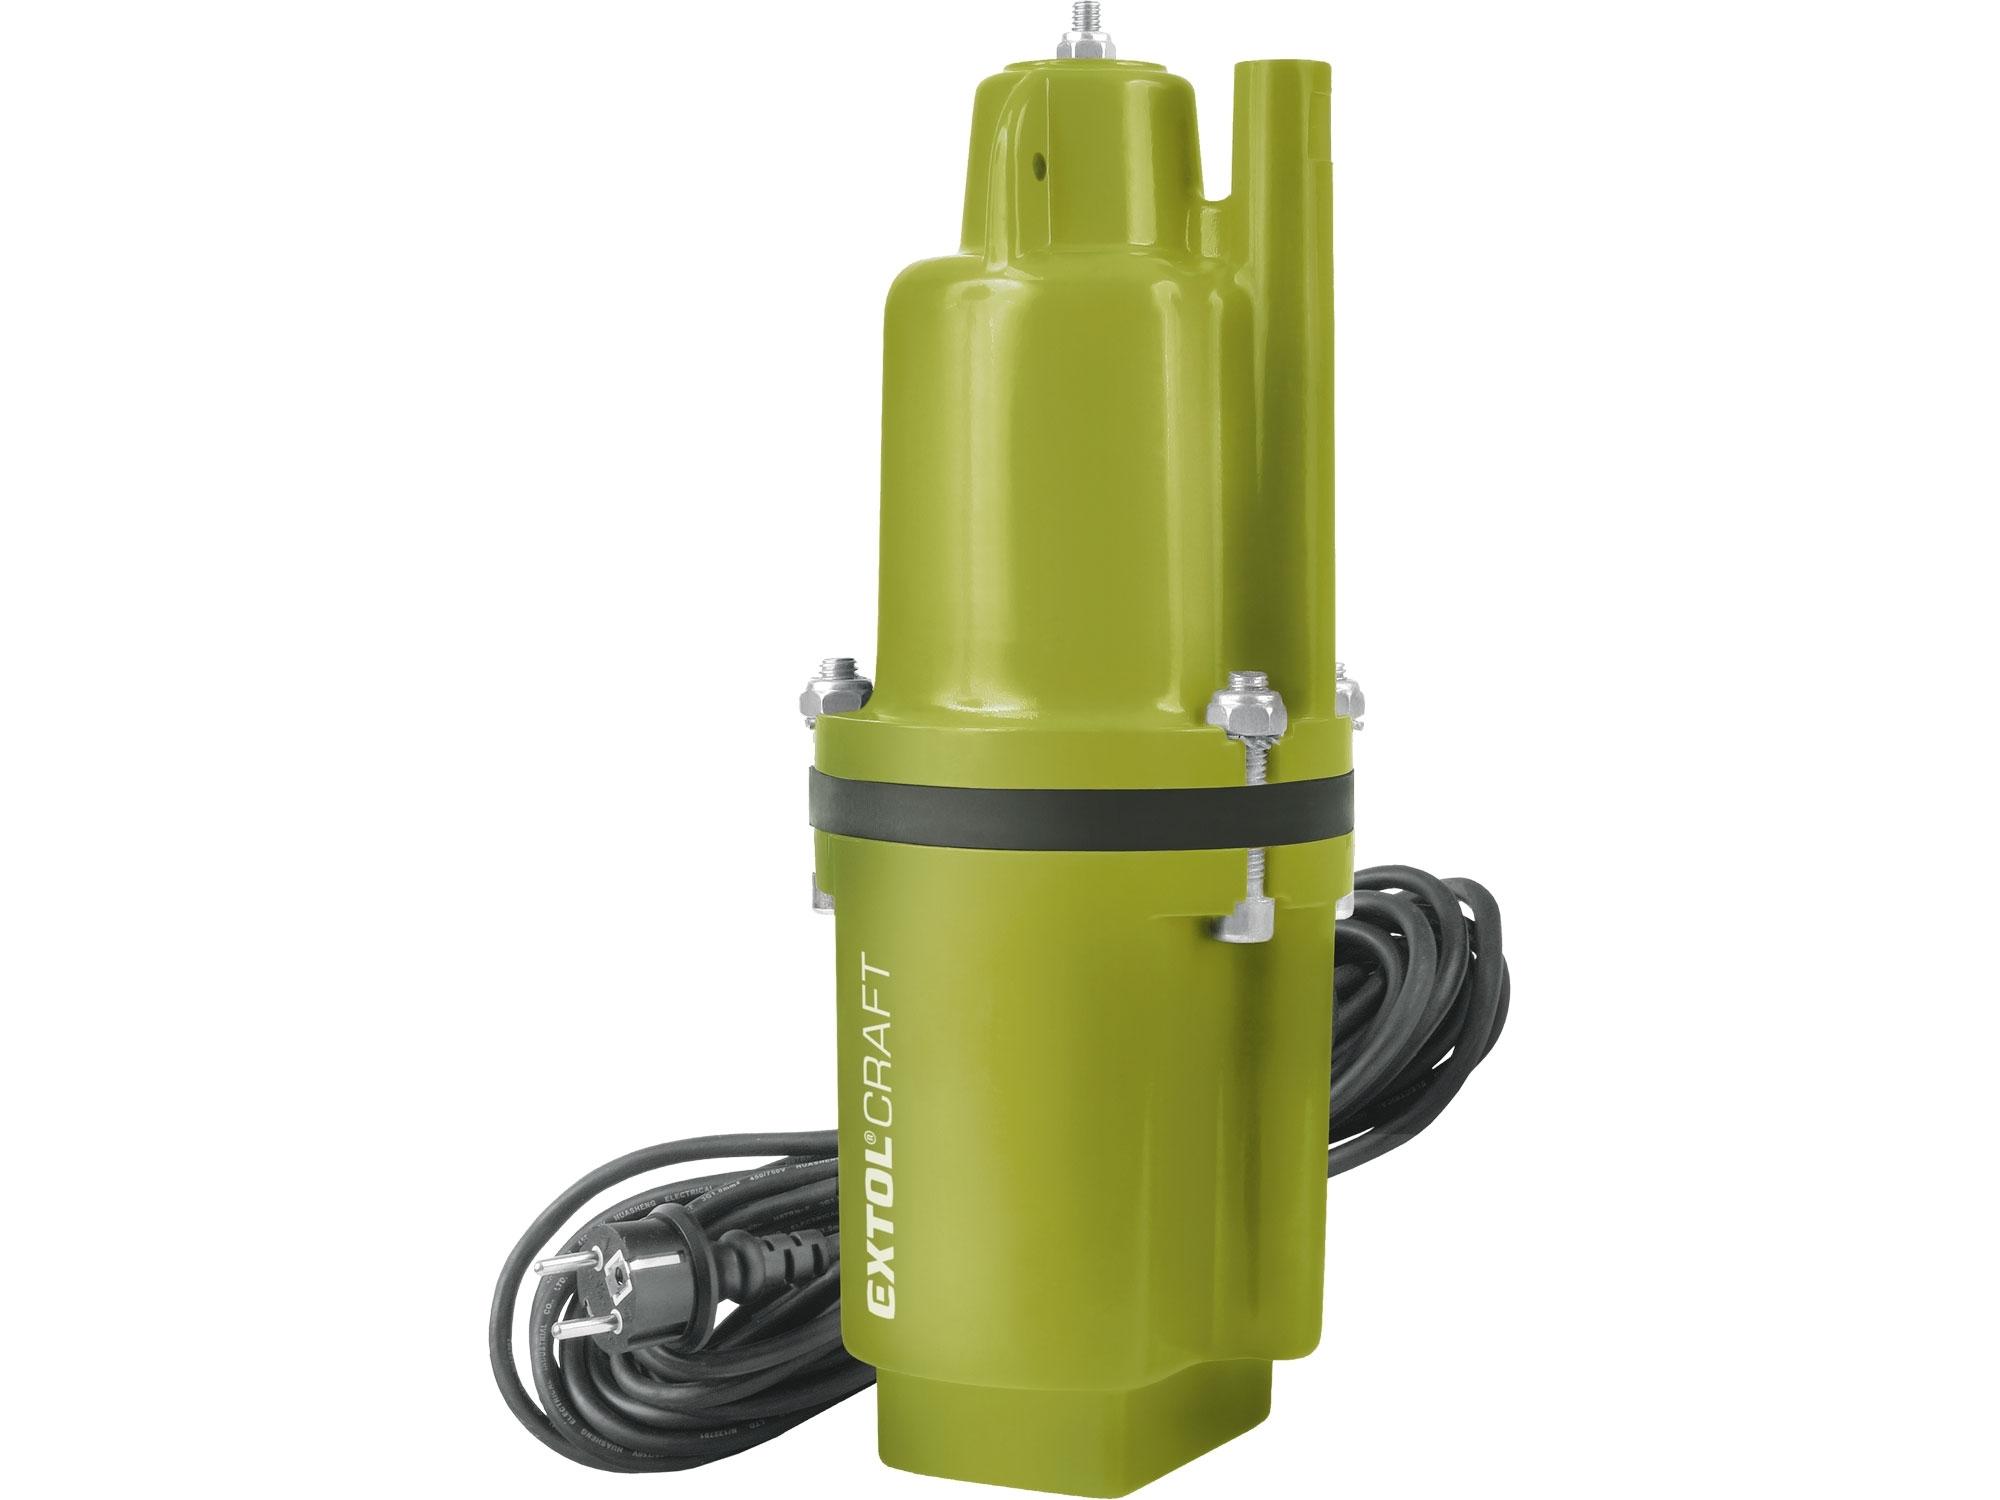 čerpadlo membránové hlubinné ponorné, 300W, 1400l/hod, 10m, EXTOL CRAFT 414170